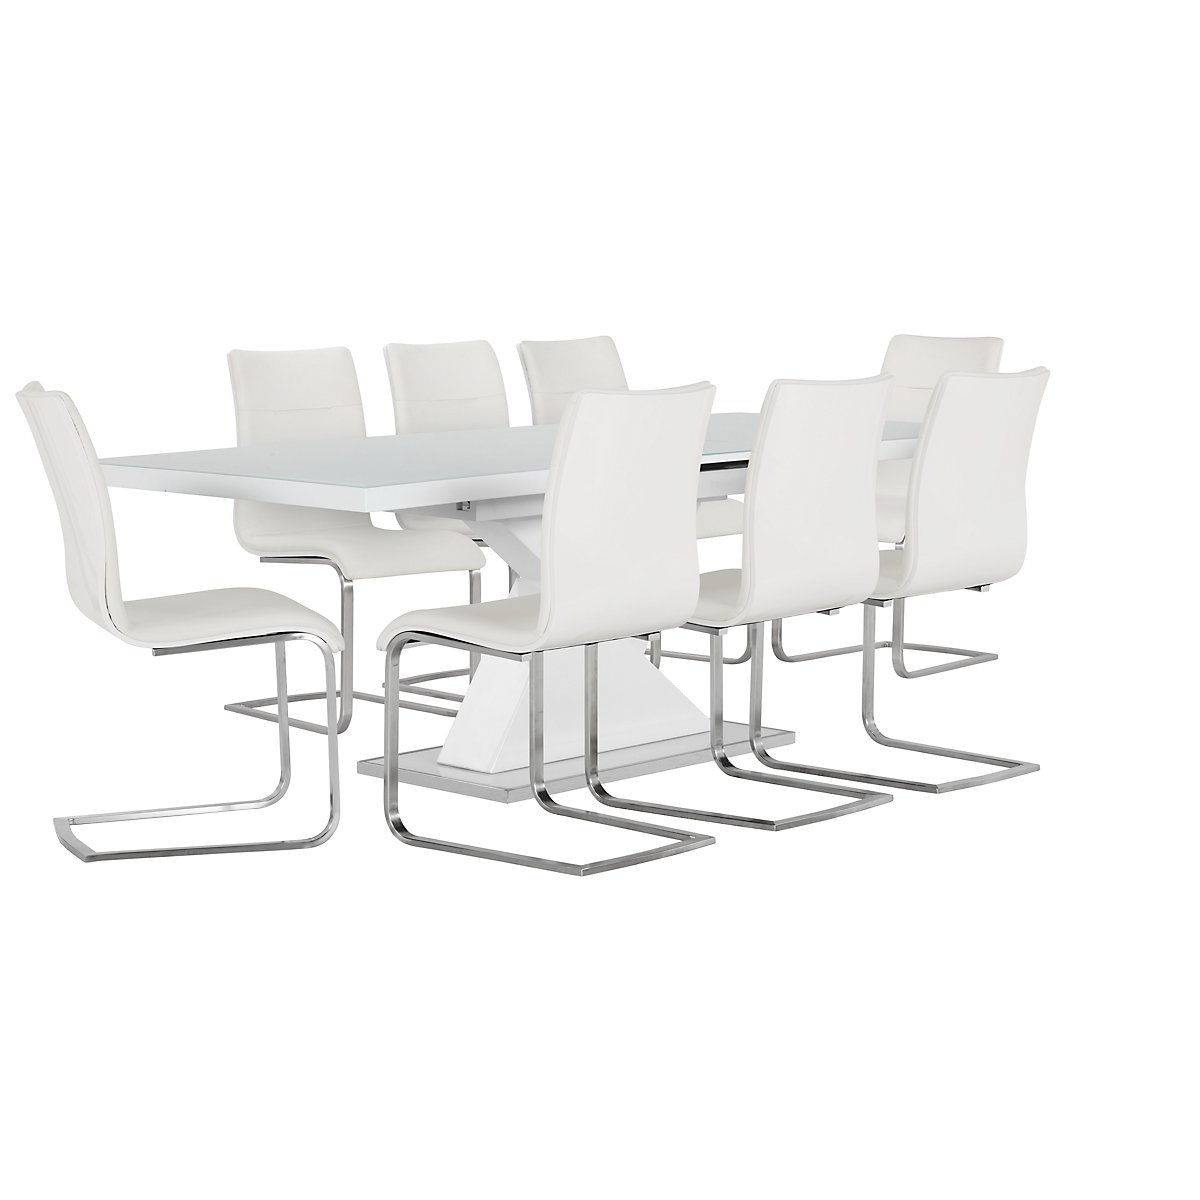 Drake White Rectangular Table & 4 Upholstered Chairs